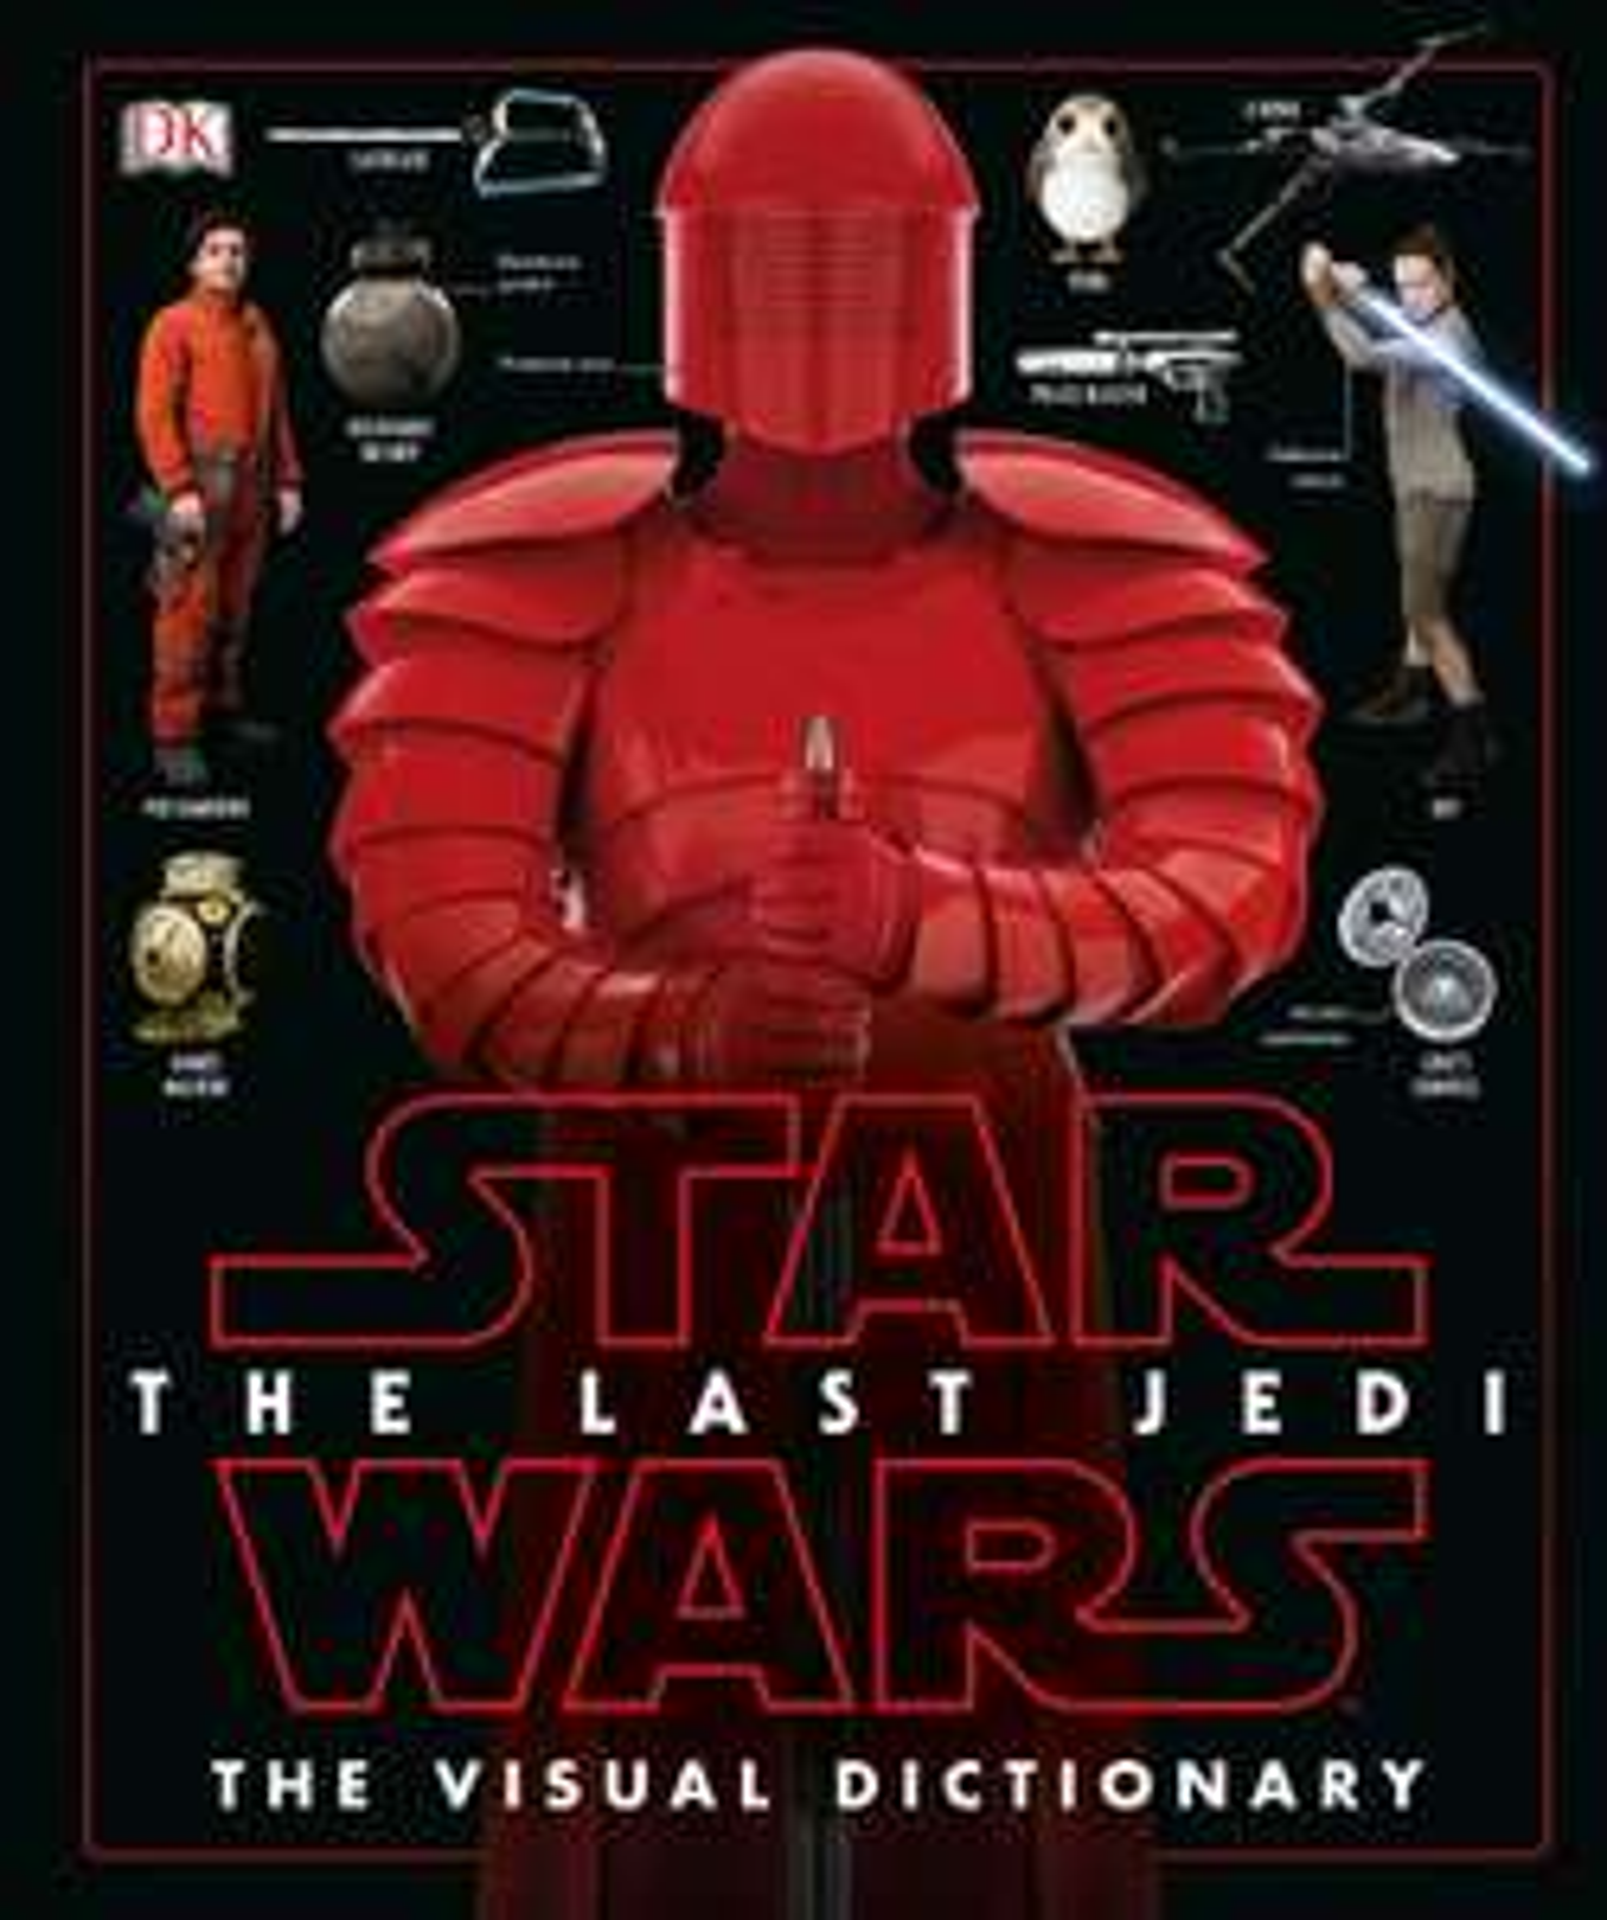 Star Wars - The Last Jedi - Bilderlexikon (engl.)